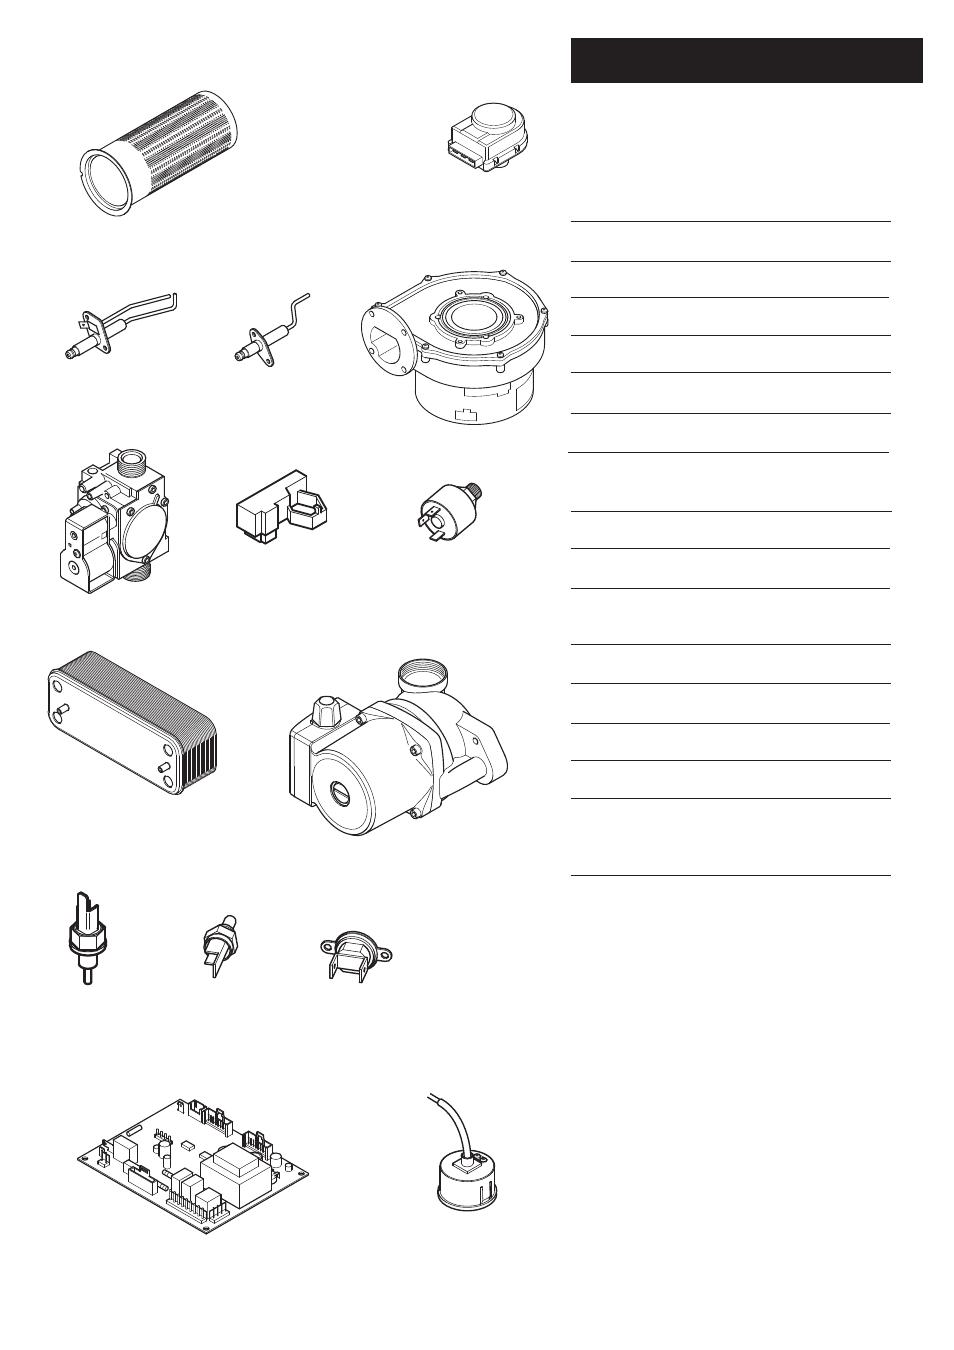 0 short parts list | Baxi Potterton Heatmax Combi HE Condensing ...